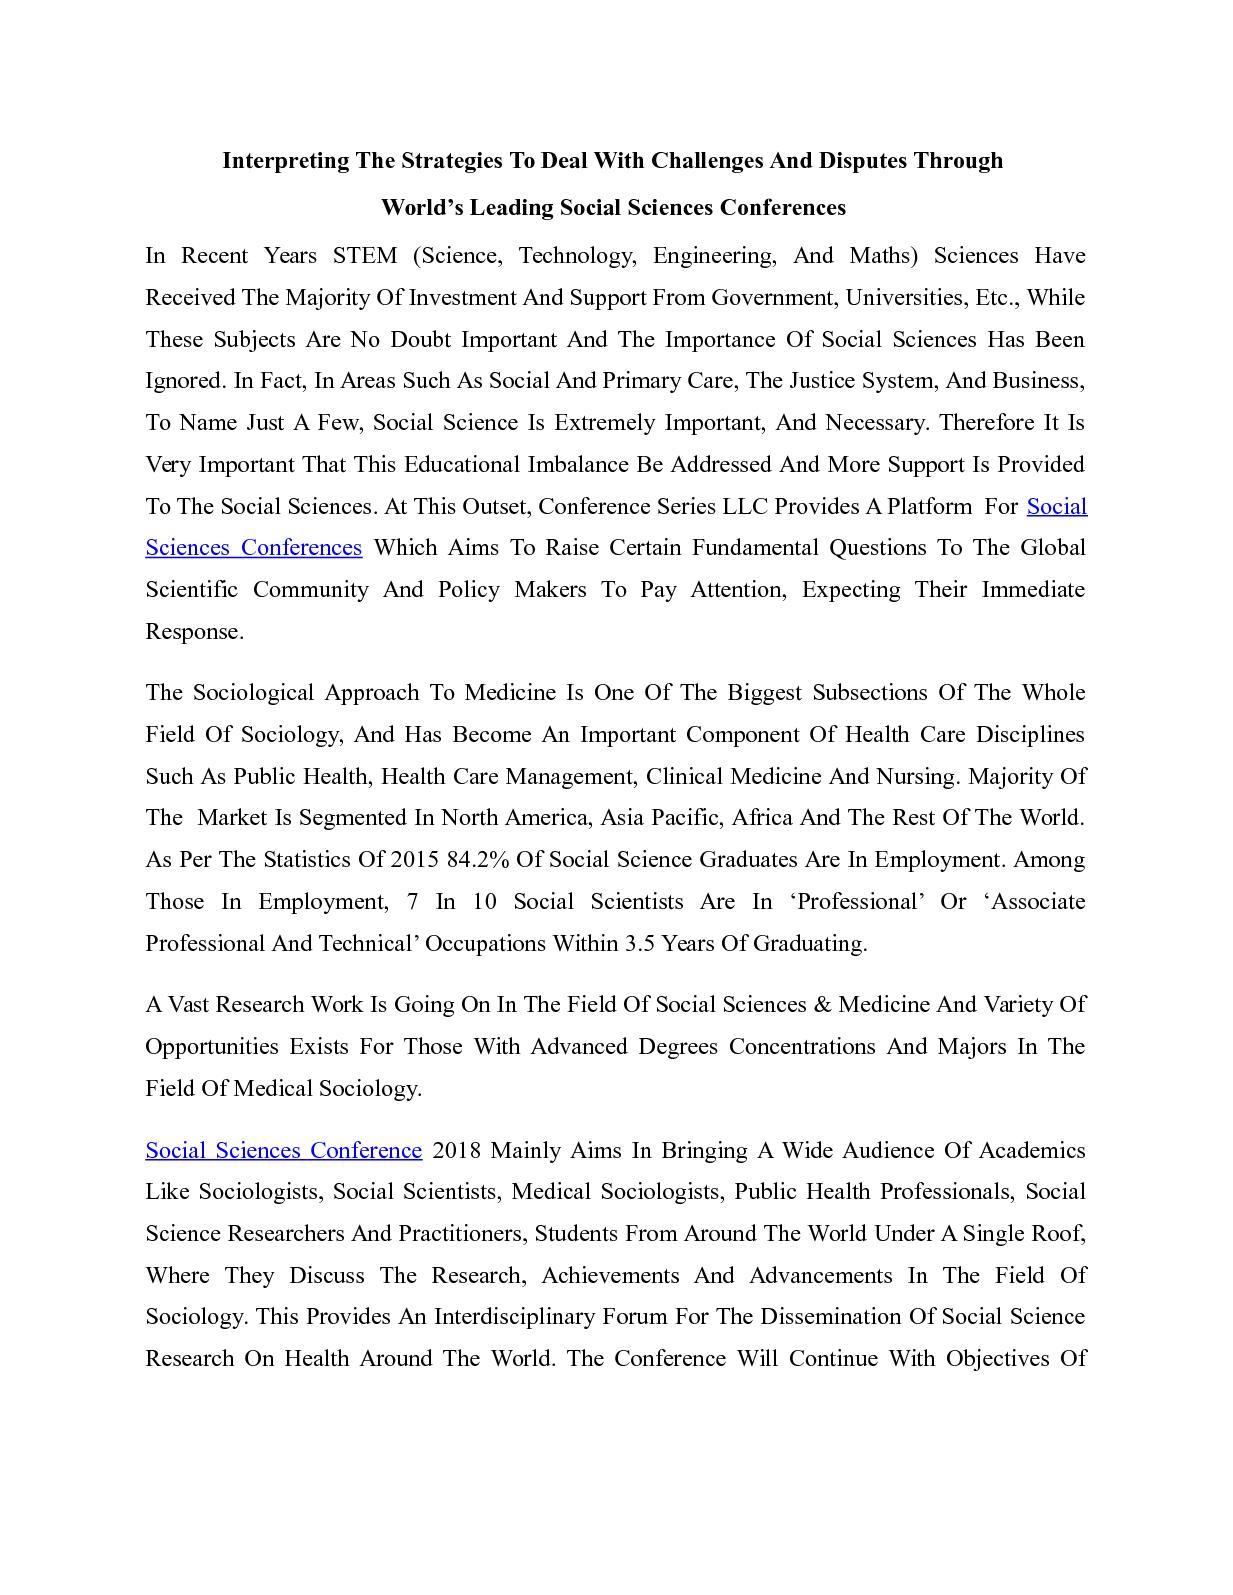 012 Essay On Importance Of Social Science P1 Rare Full